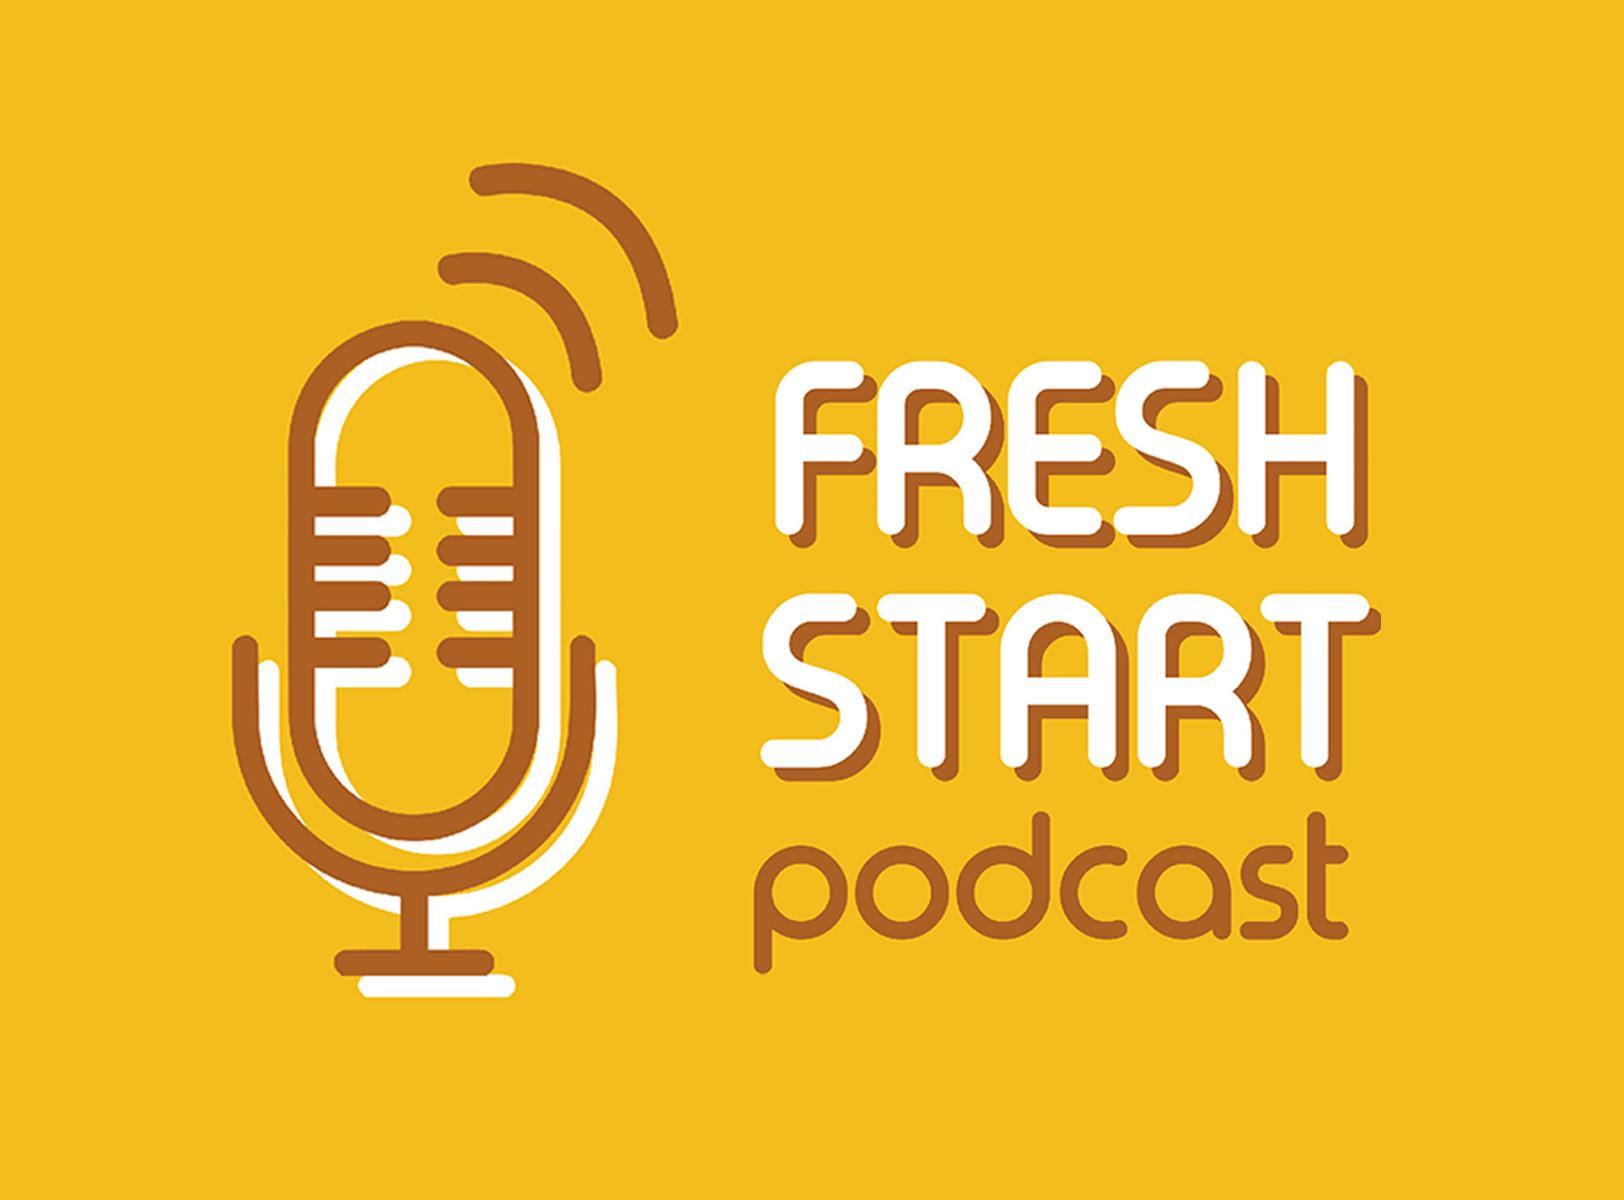 Fresh Start: Podcast News (9/25/2018 Tue.)